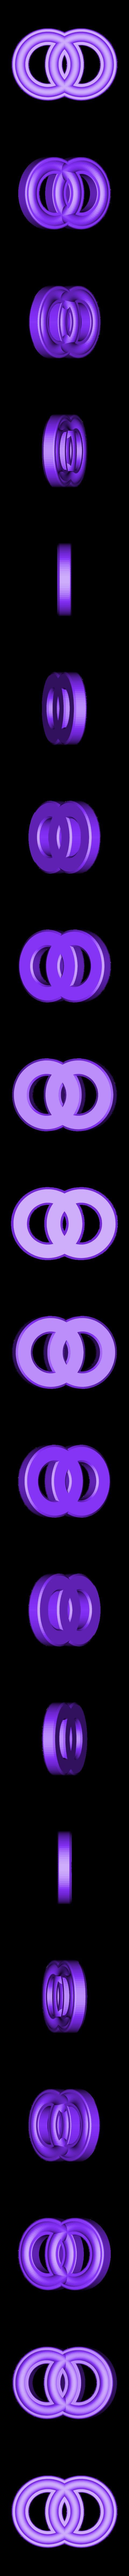 MarbleRingFree_14mm.stl Download free STL file Smiley Face Marble Rings, Hungarian Rings, Marble Fun • 3D printable design, LGBU